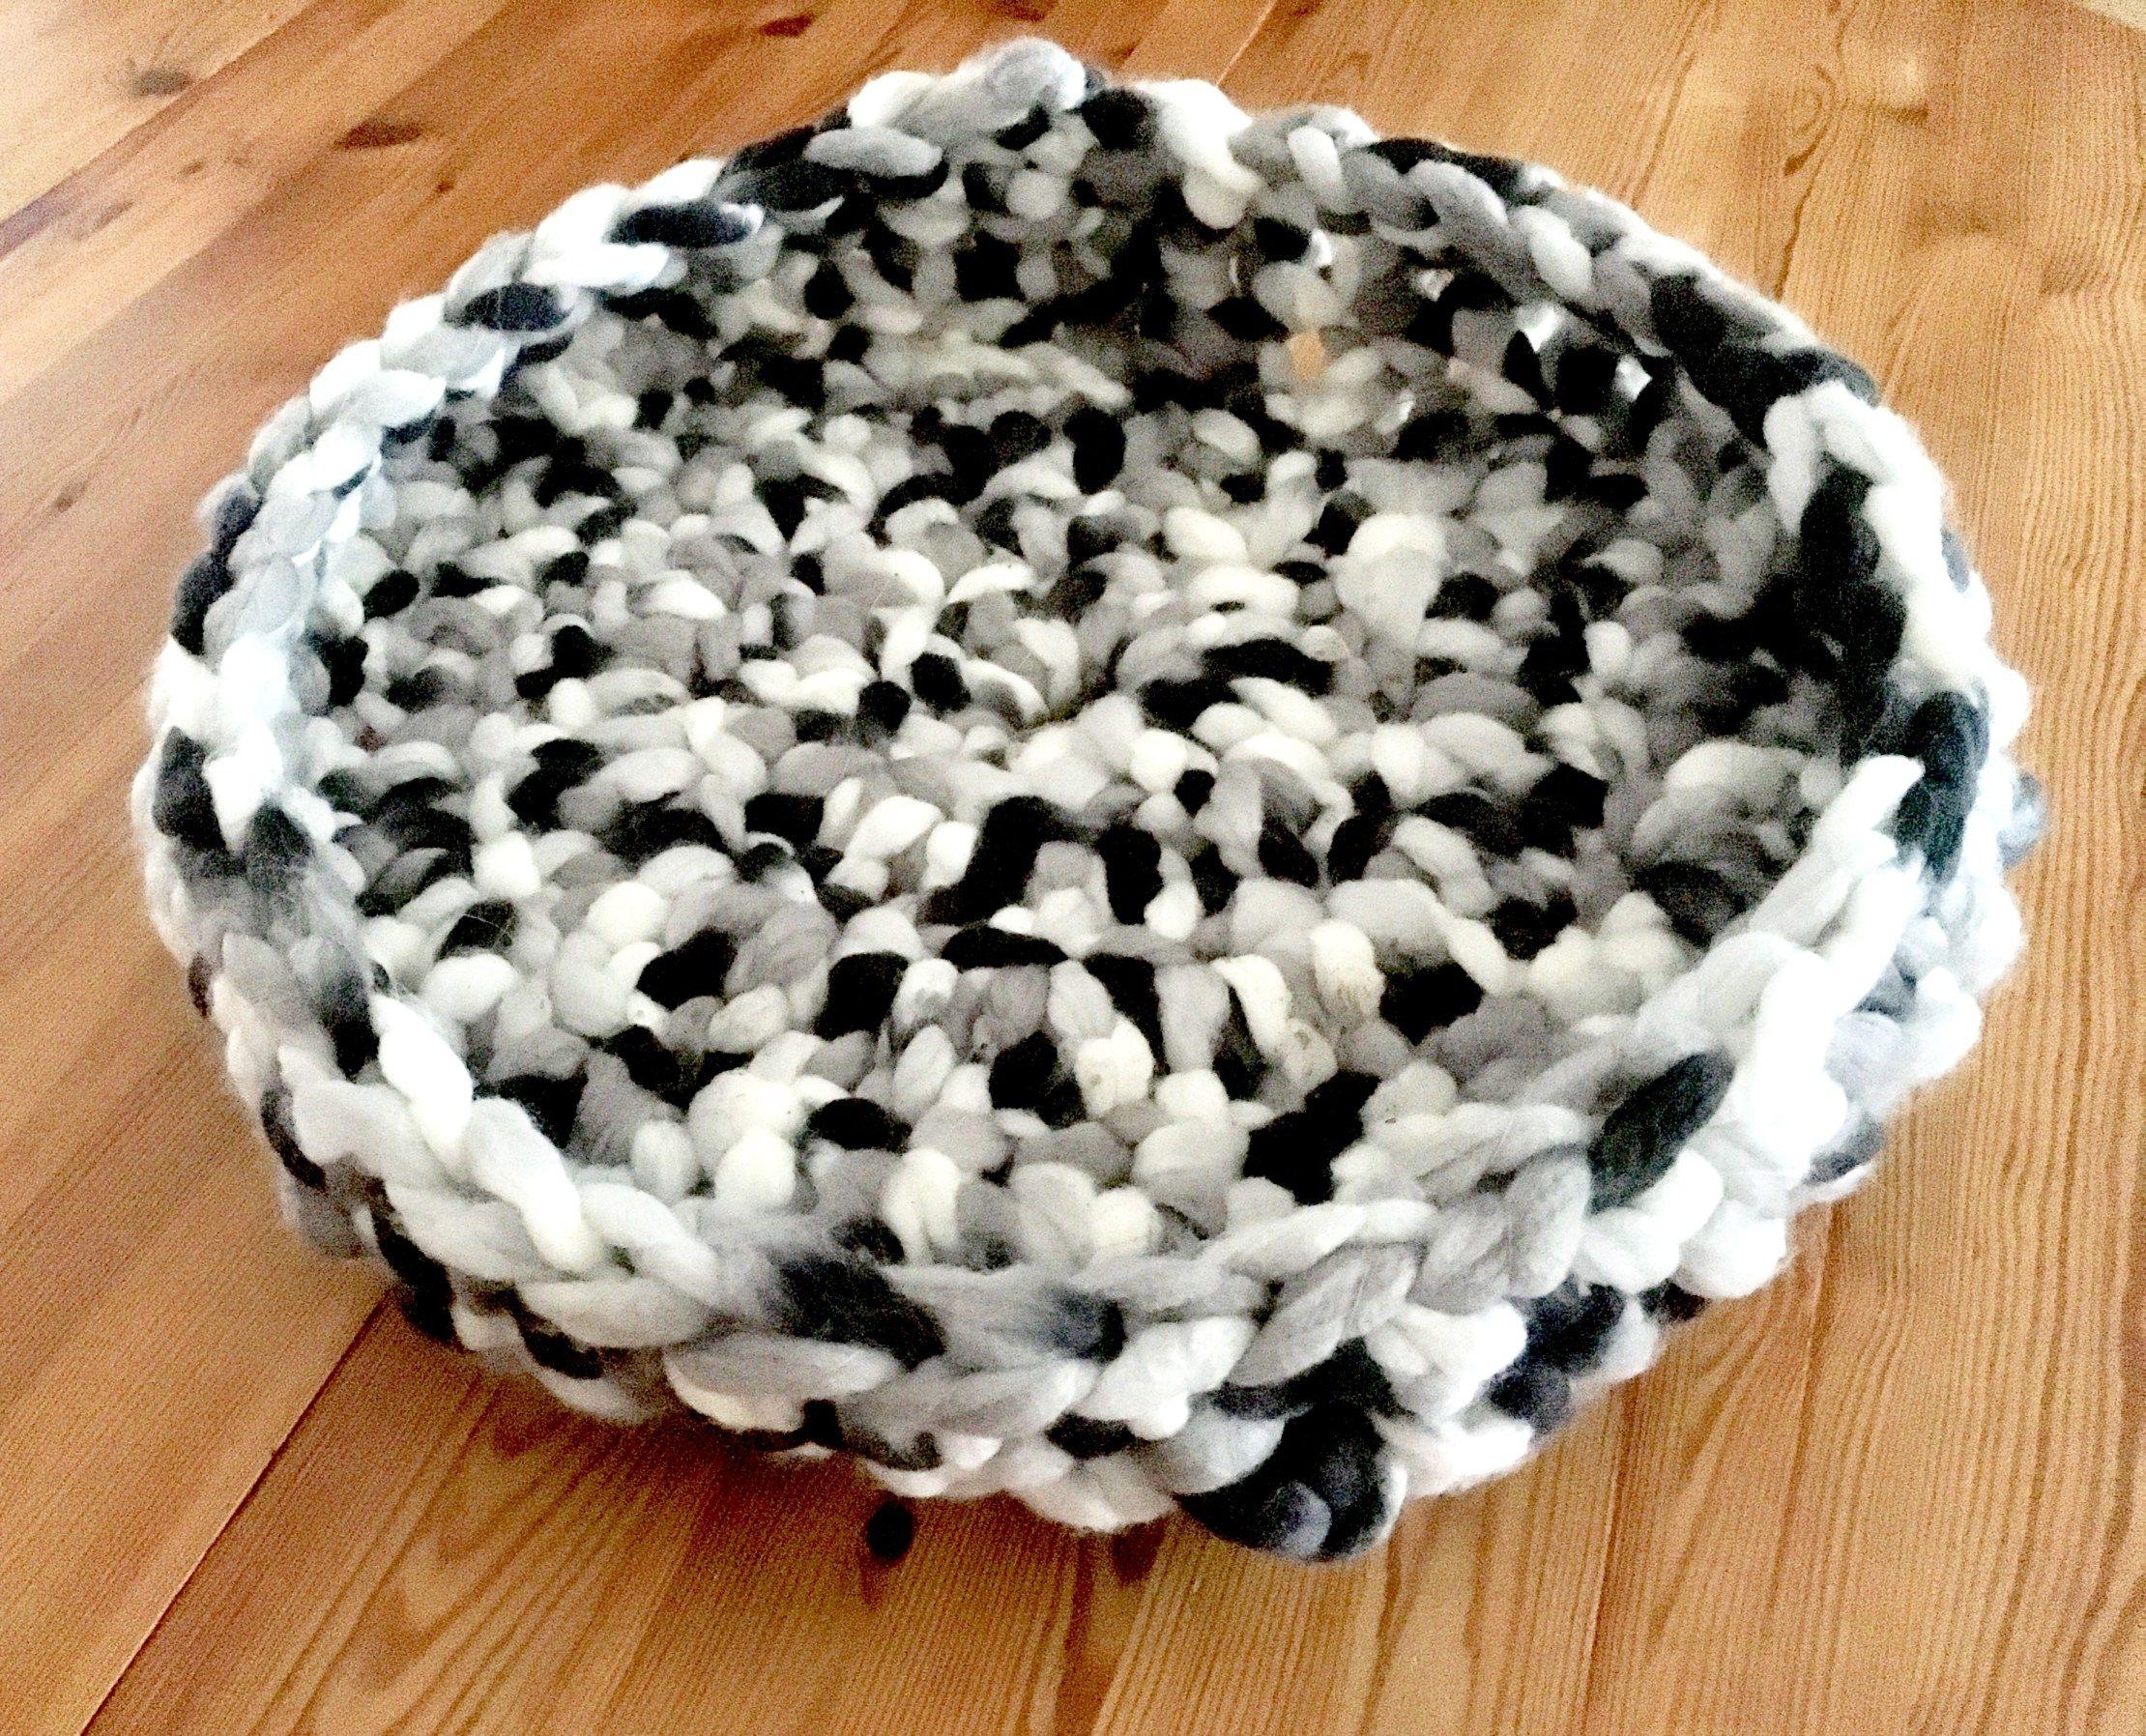 Crochet cat bed chunky giant yarn crochet hook tutorial